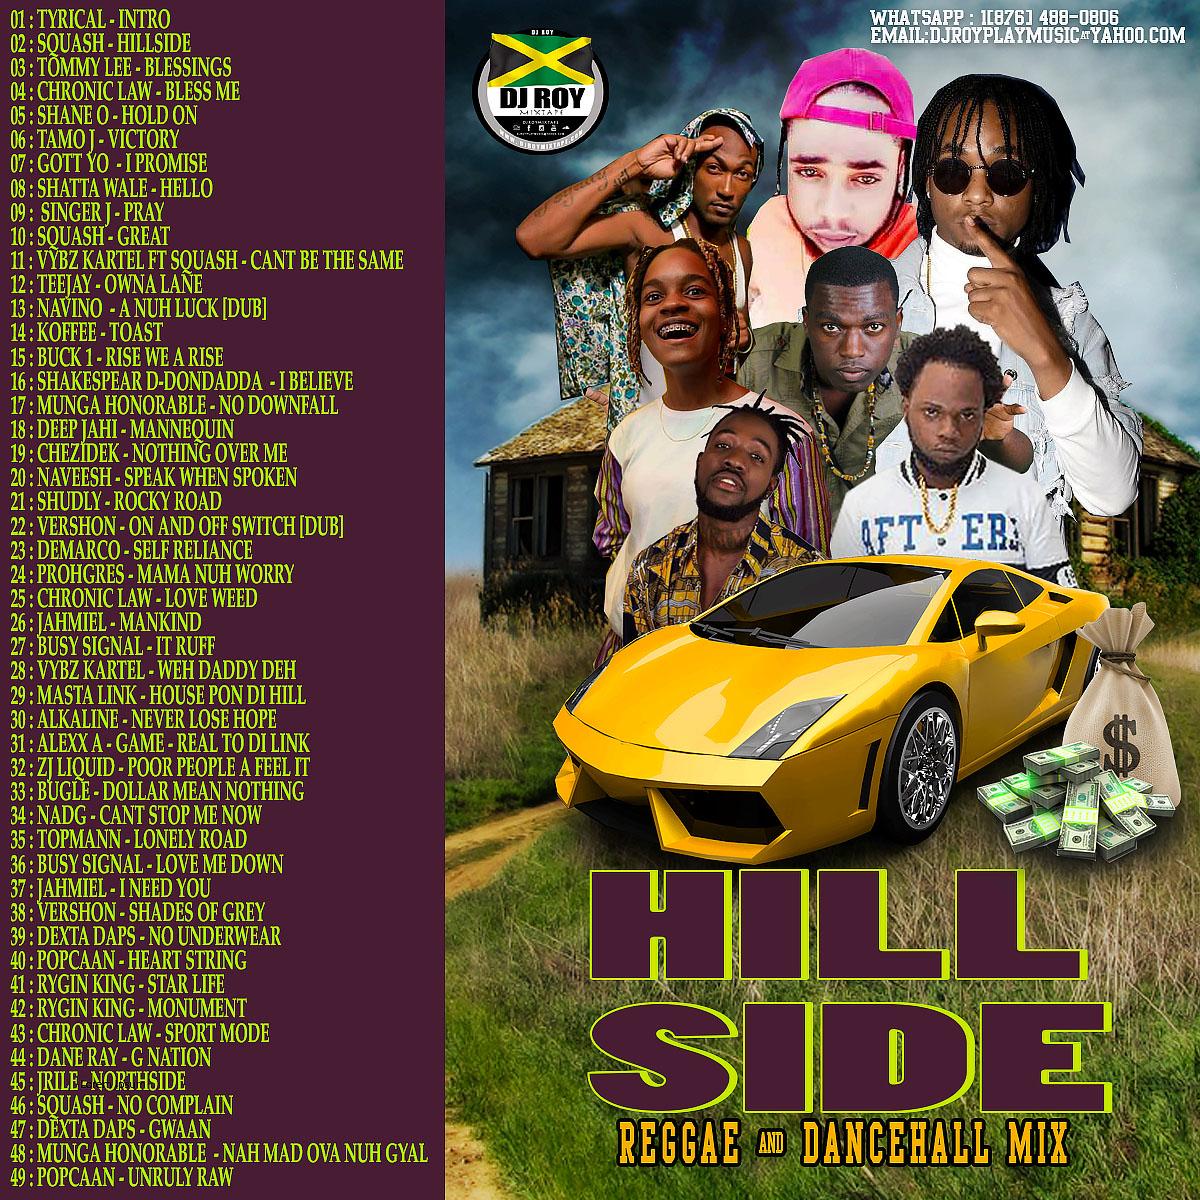 DJROYMIXTAPE : DJ ROY HILLSIDE REGGAE & DANCEHALL MIX 2019